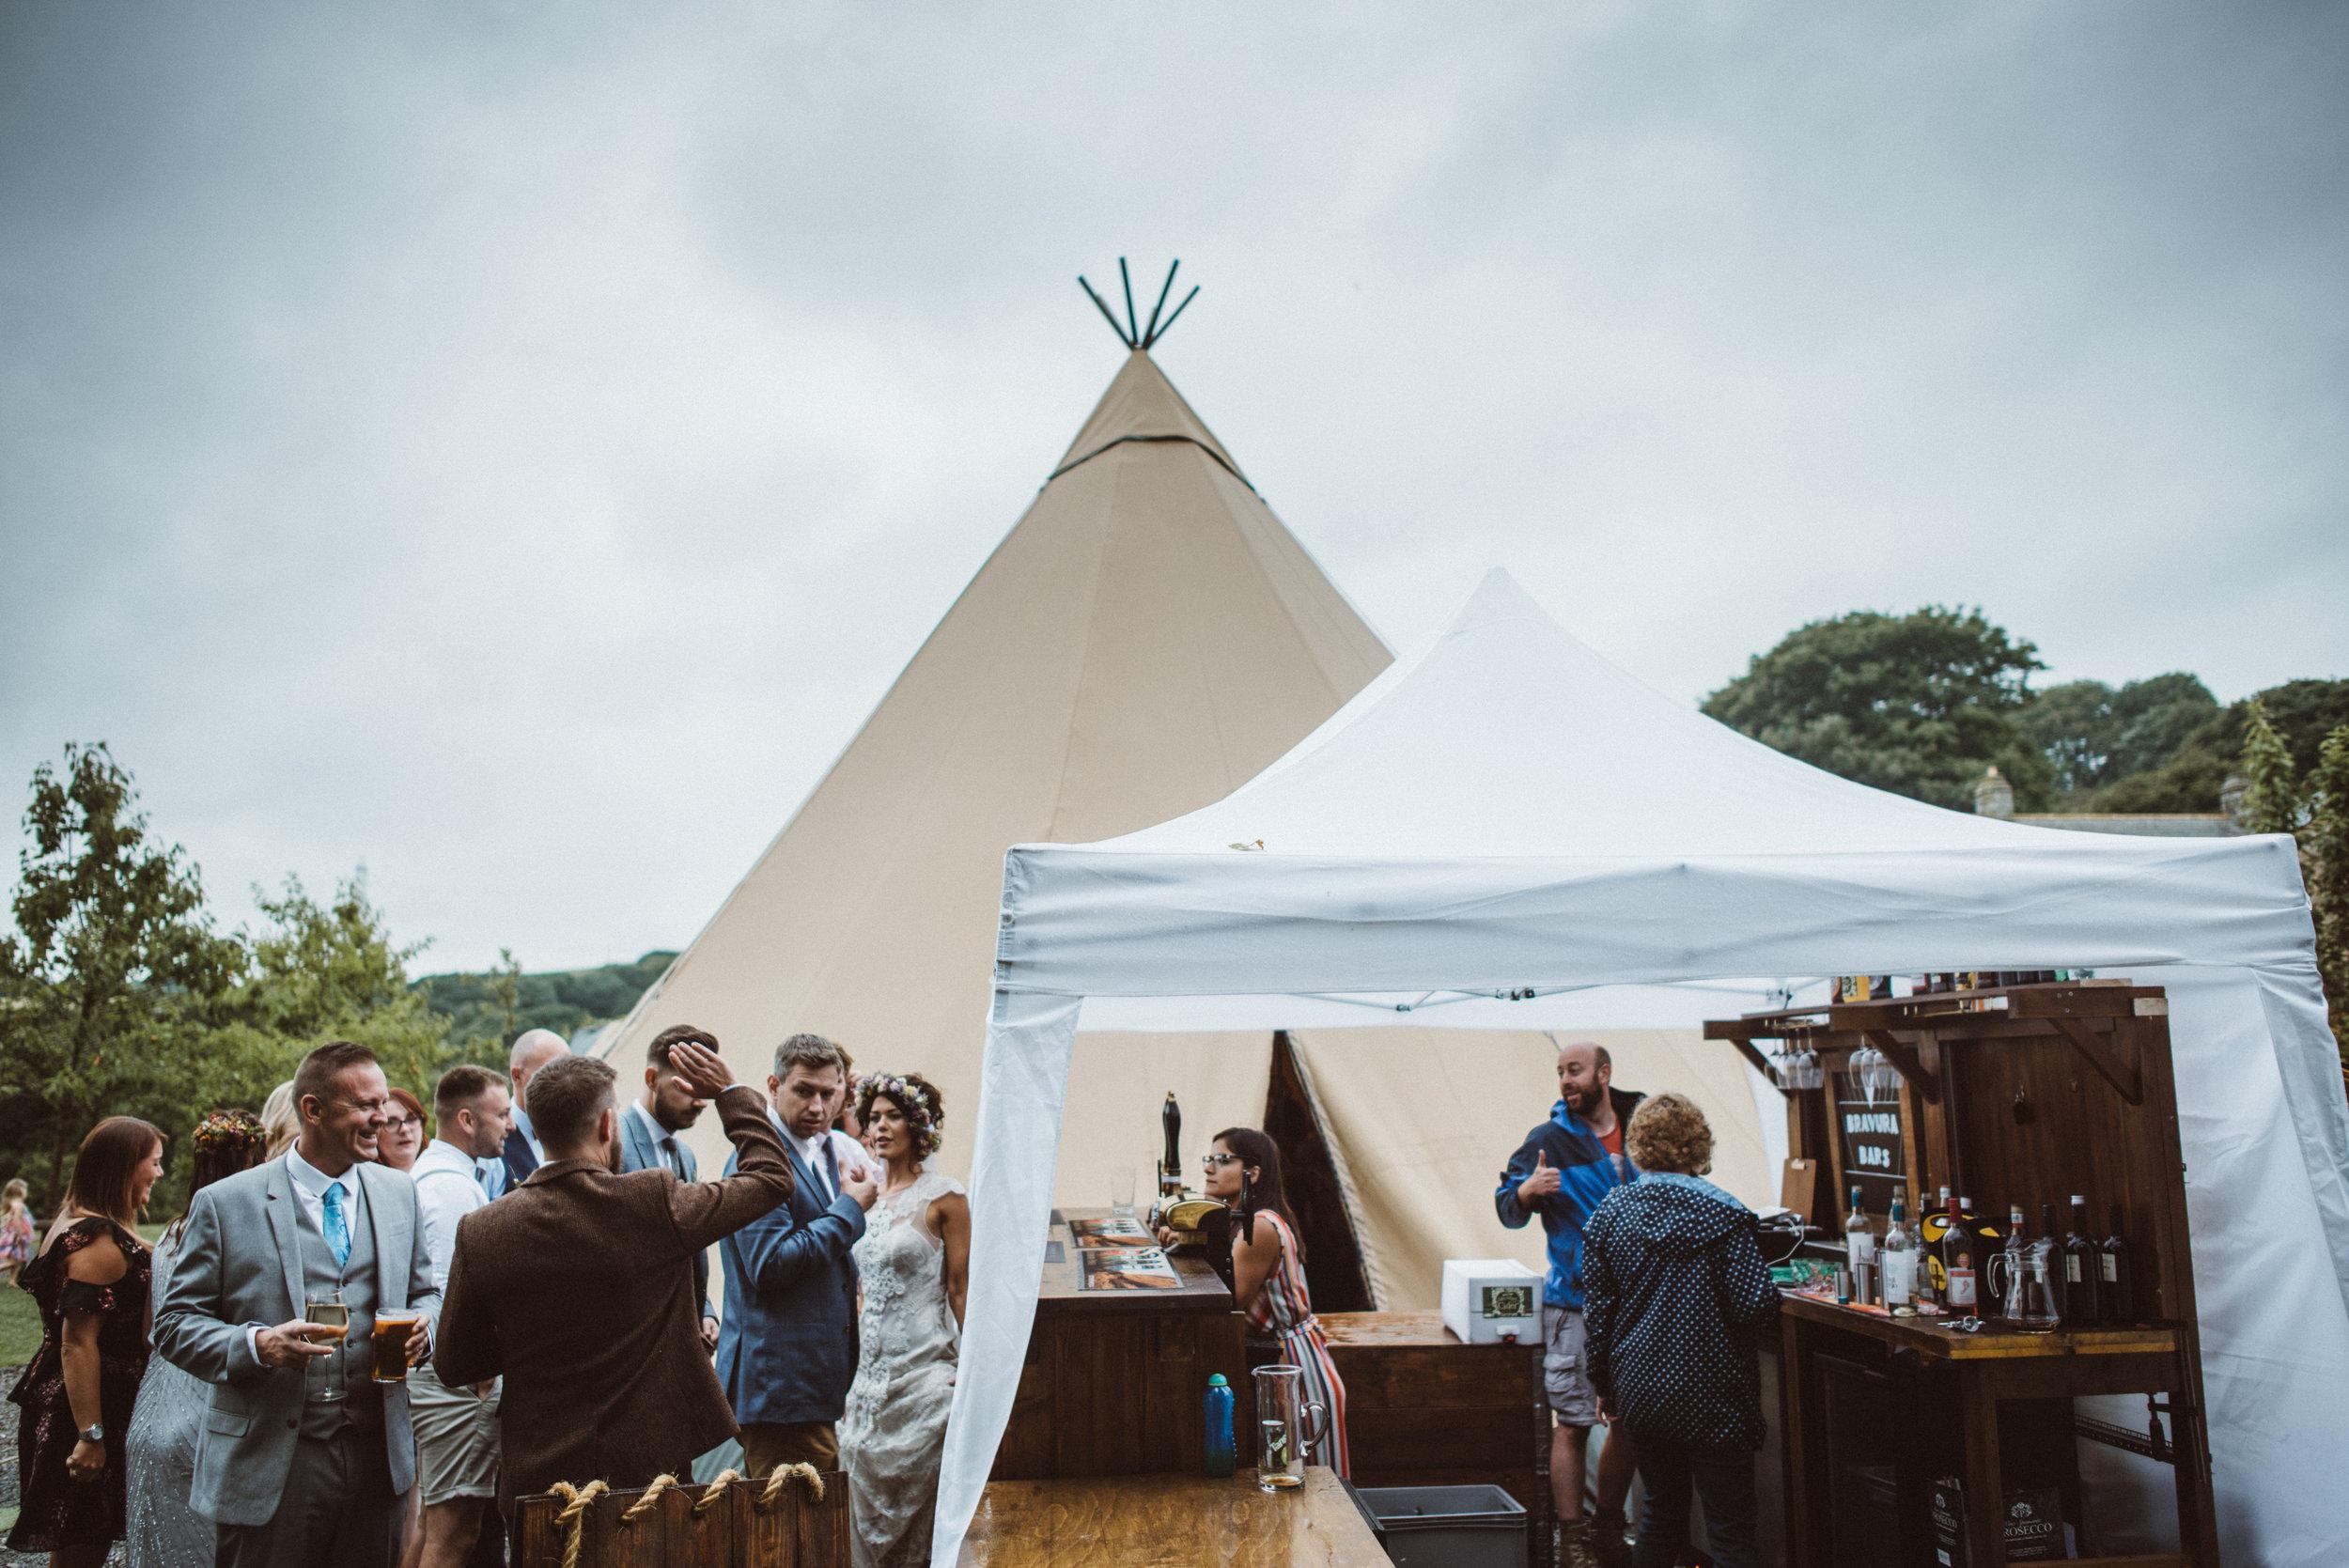 pengenna-manor-wedding-photographer-37.jpg